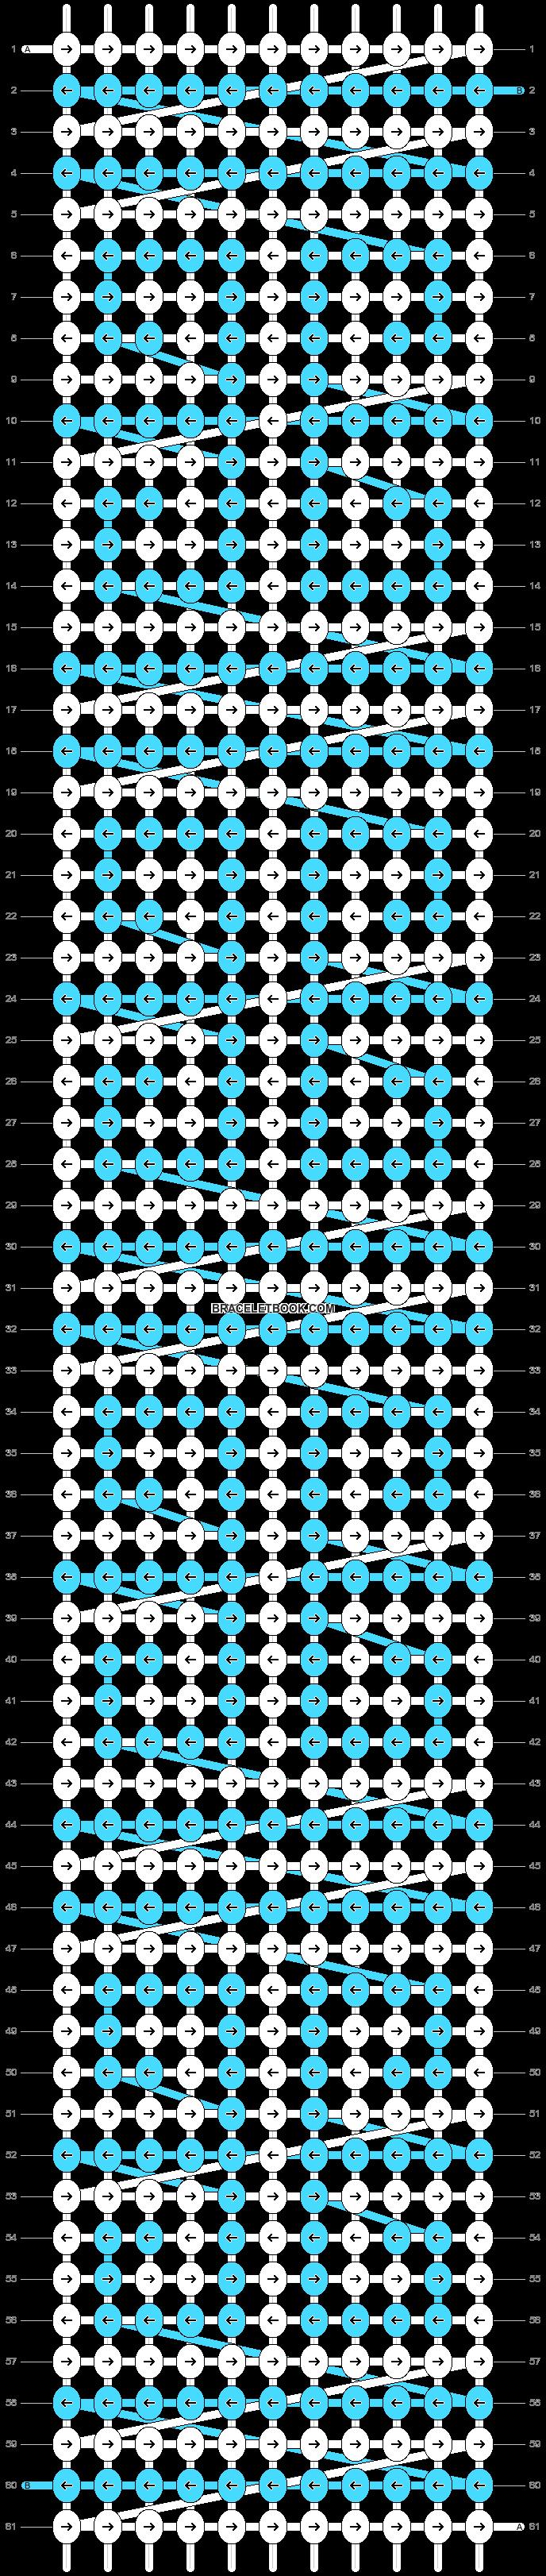 Alpha pattern #20945 pattern